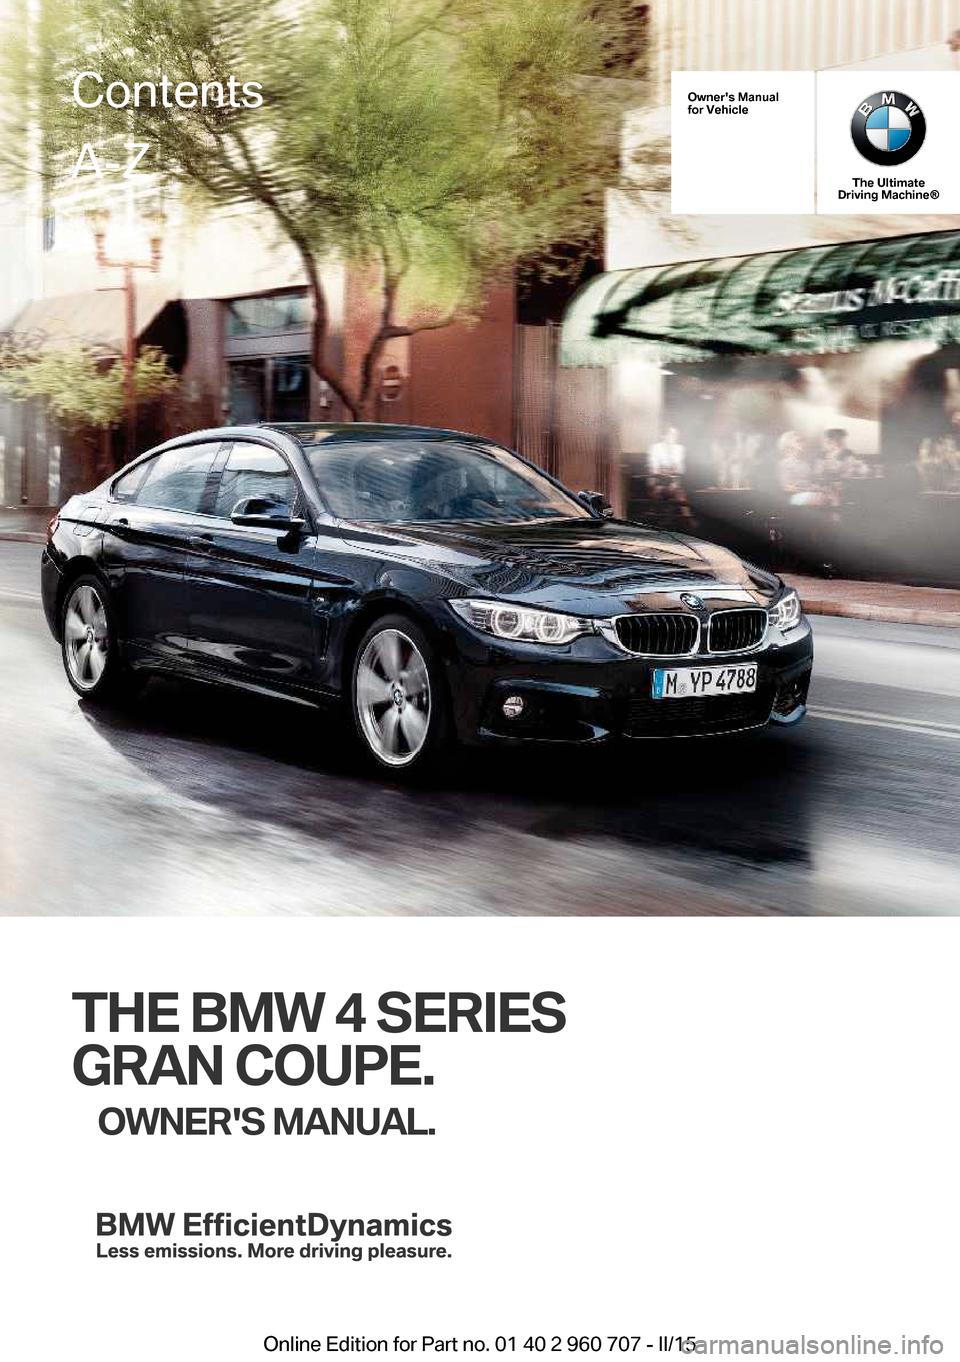 bmw 4 series gran coupe 2016 f36 owner 39 s manual. Black Bedroom Furniture Sets. Home Design Ideas